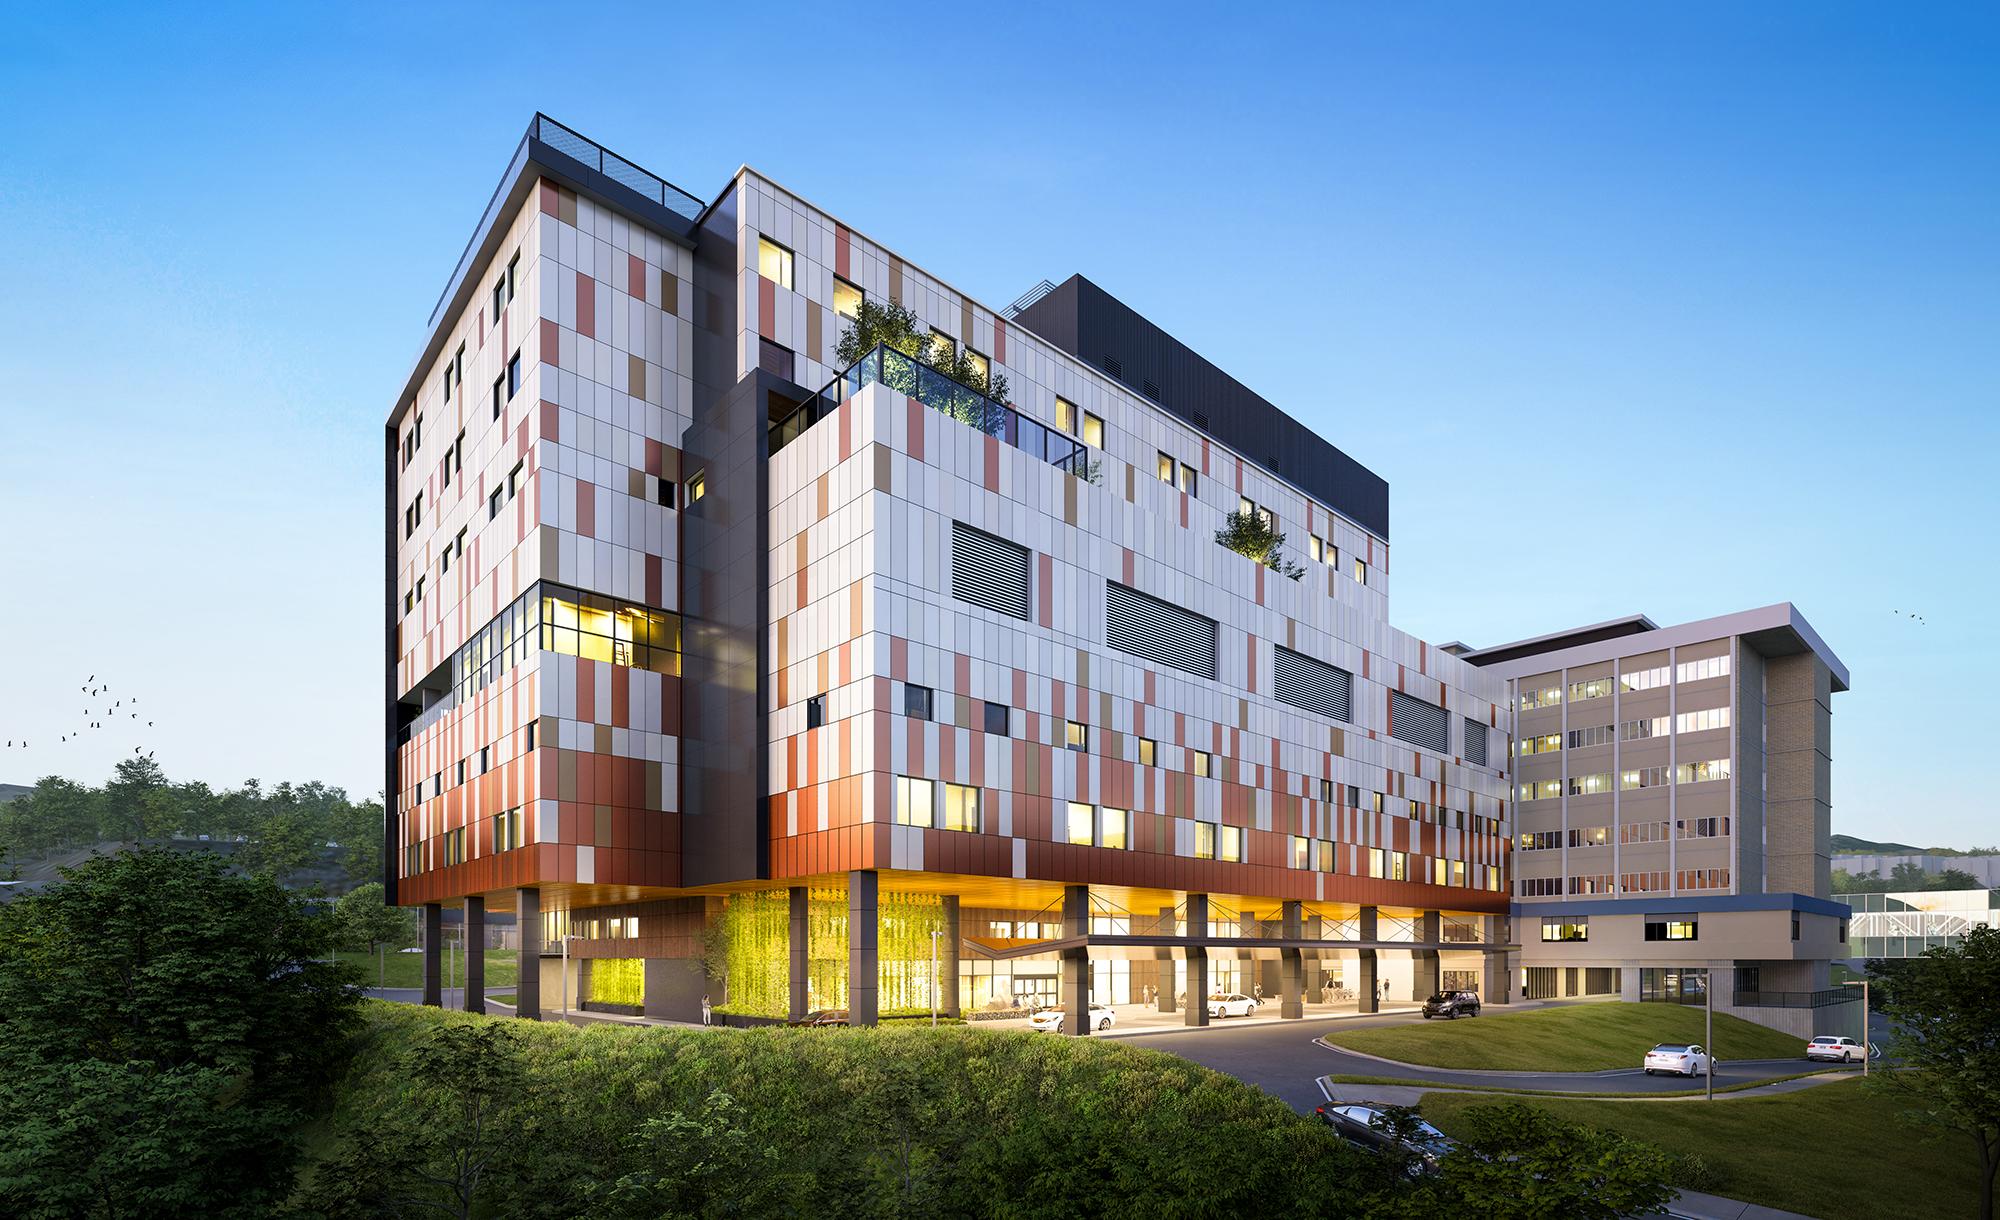 95D_Royal Inland Hospital_Ext.jpg